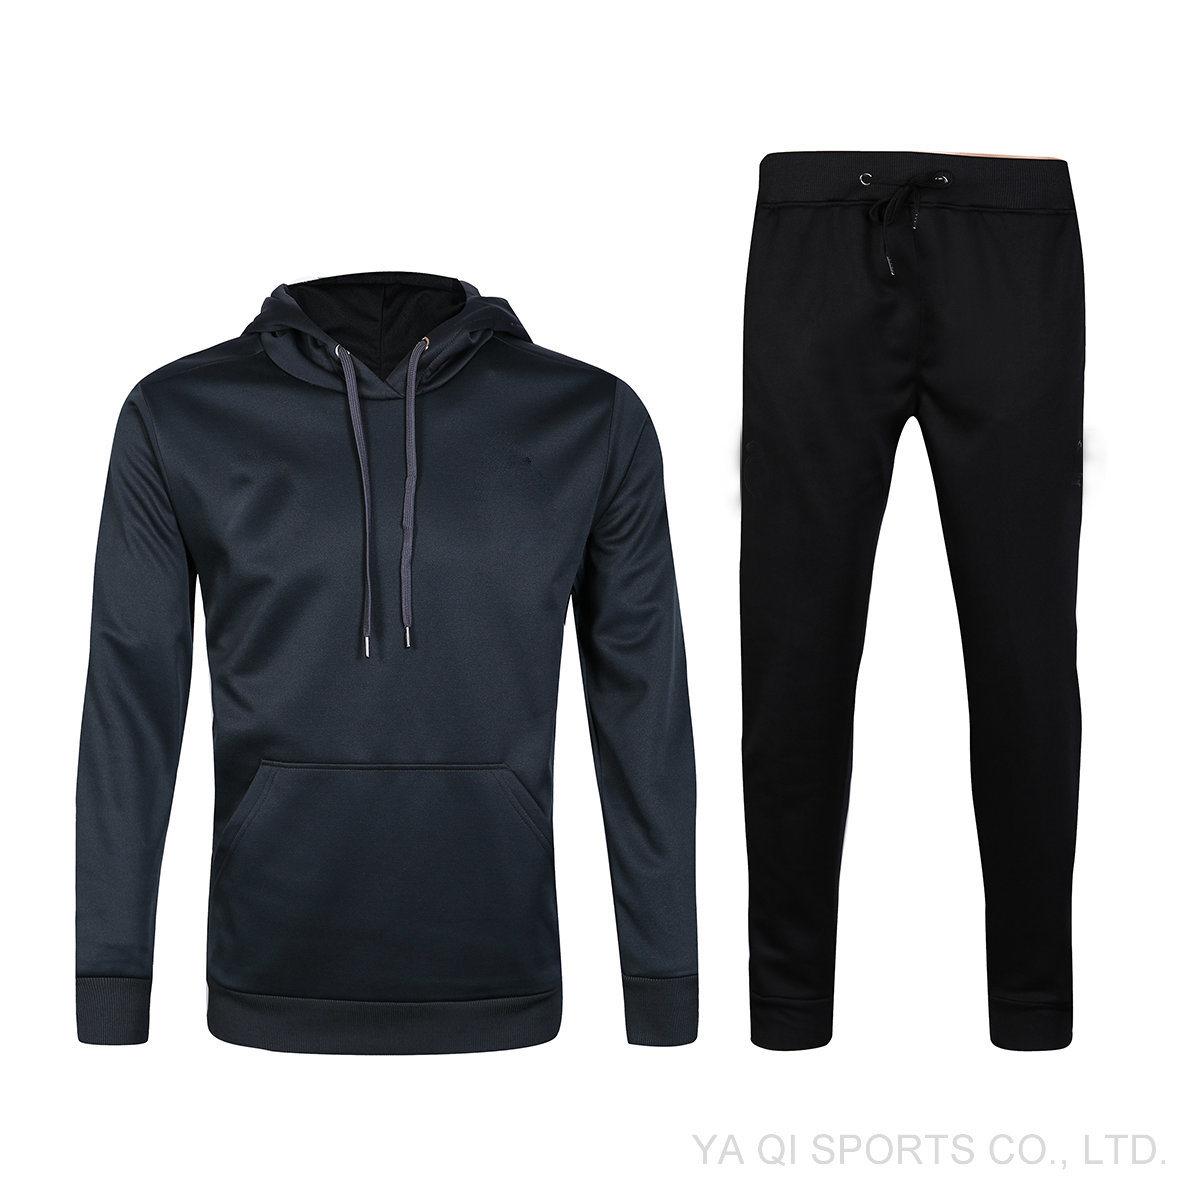 0e70e3682 [Hot Item] Wholesale Sherpa Fleece Pullover Longline Hoodie with Woven Cut  Plain Tracksuit 100% Cotton Custom Hoodies